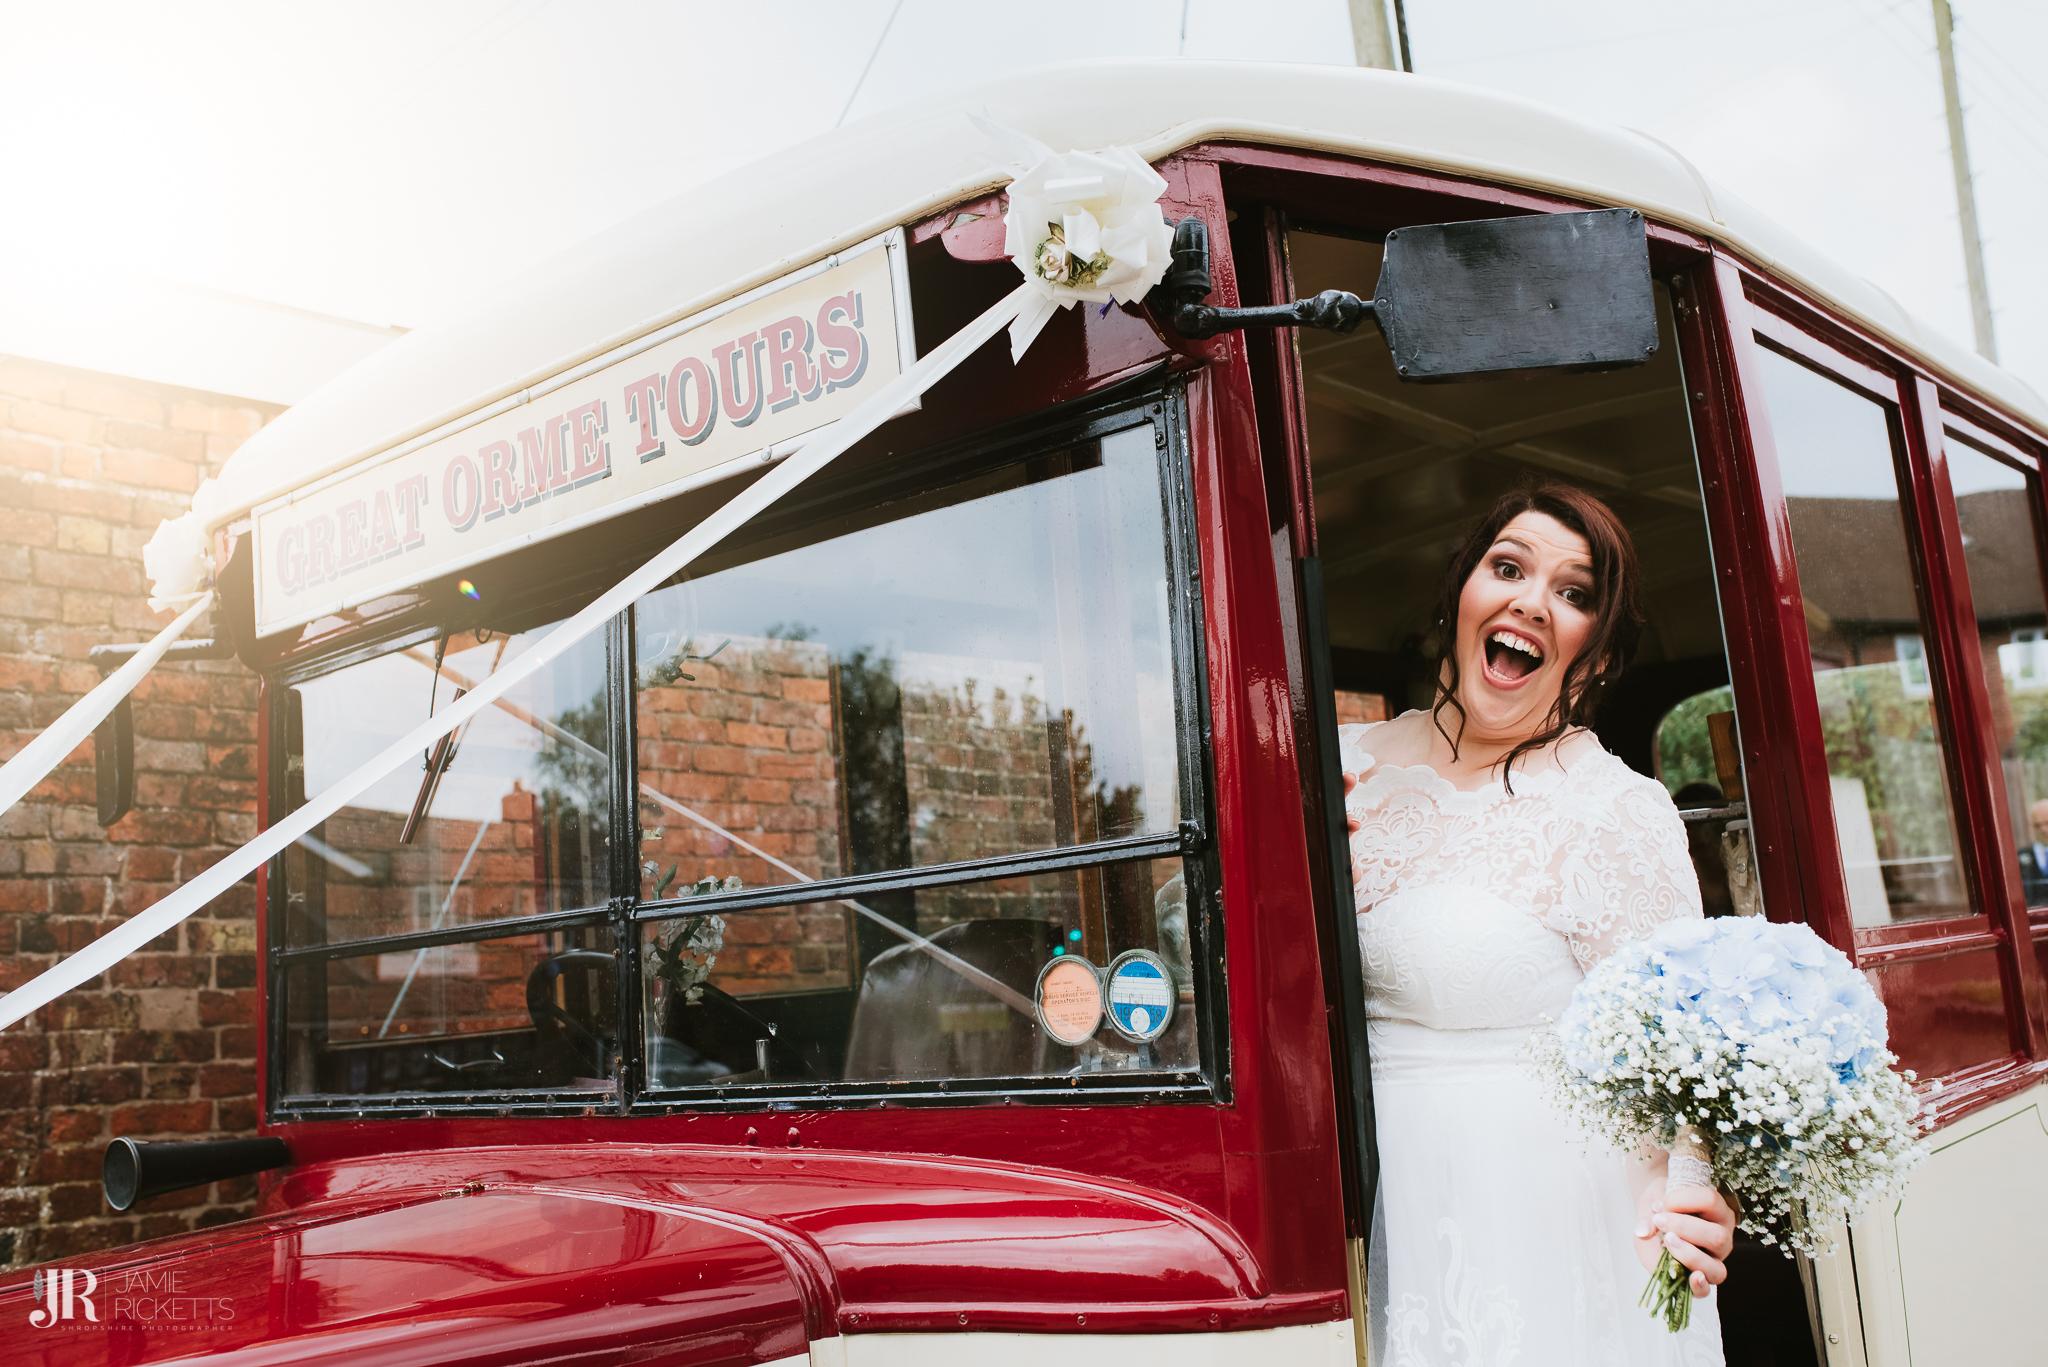 Wedding-Photographer-Shropshire-19.JPG